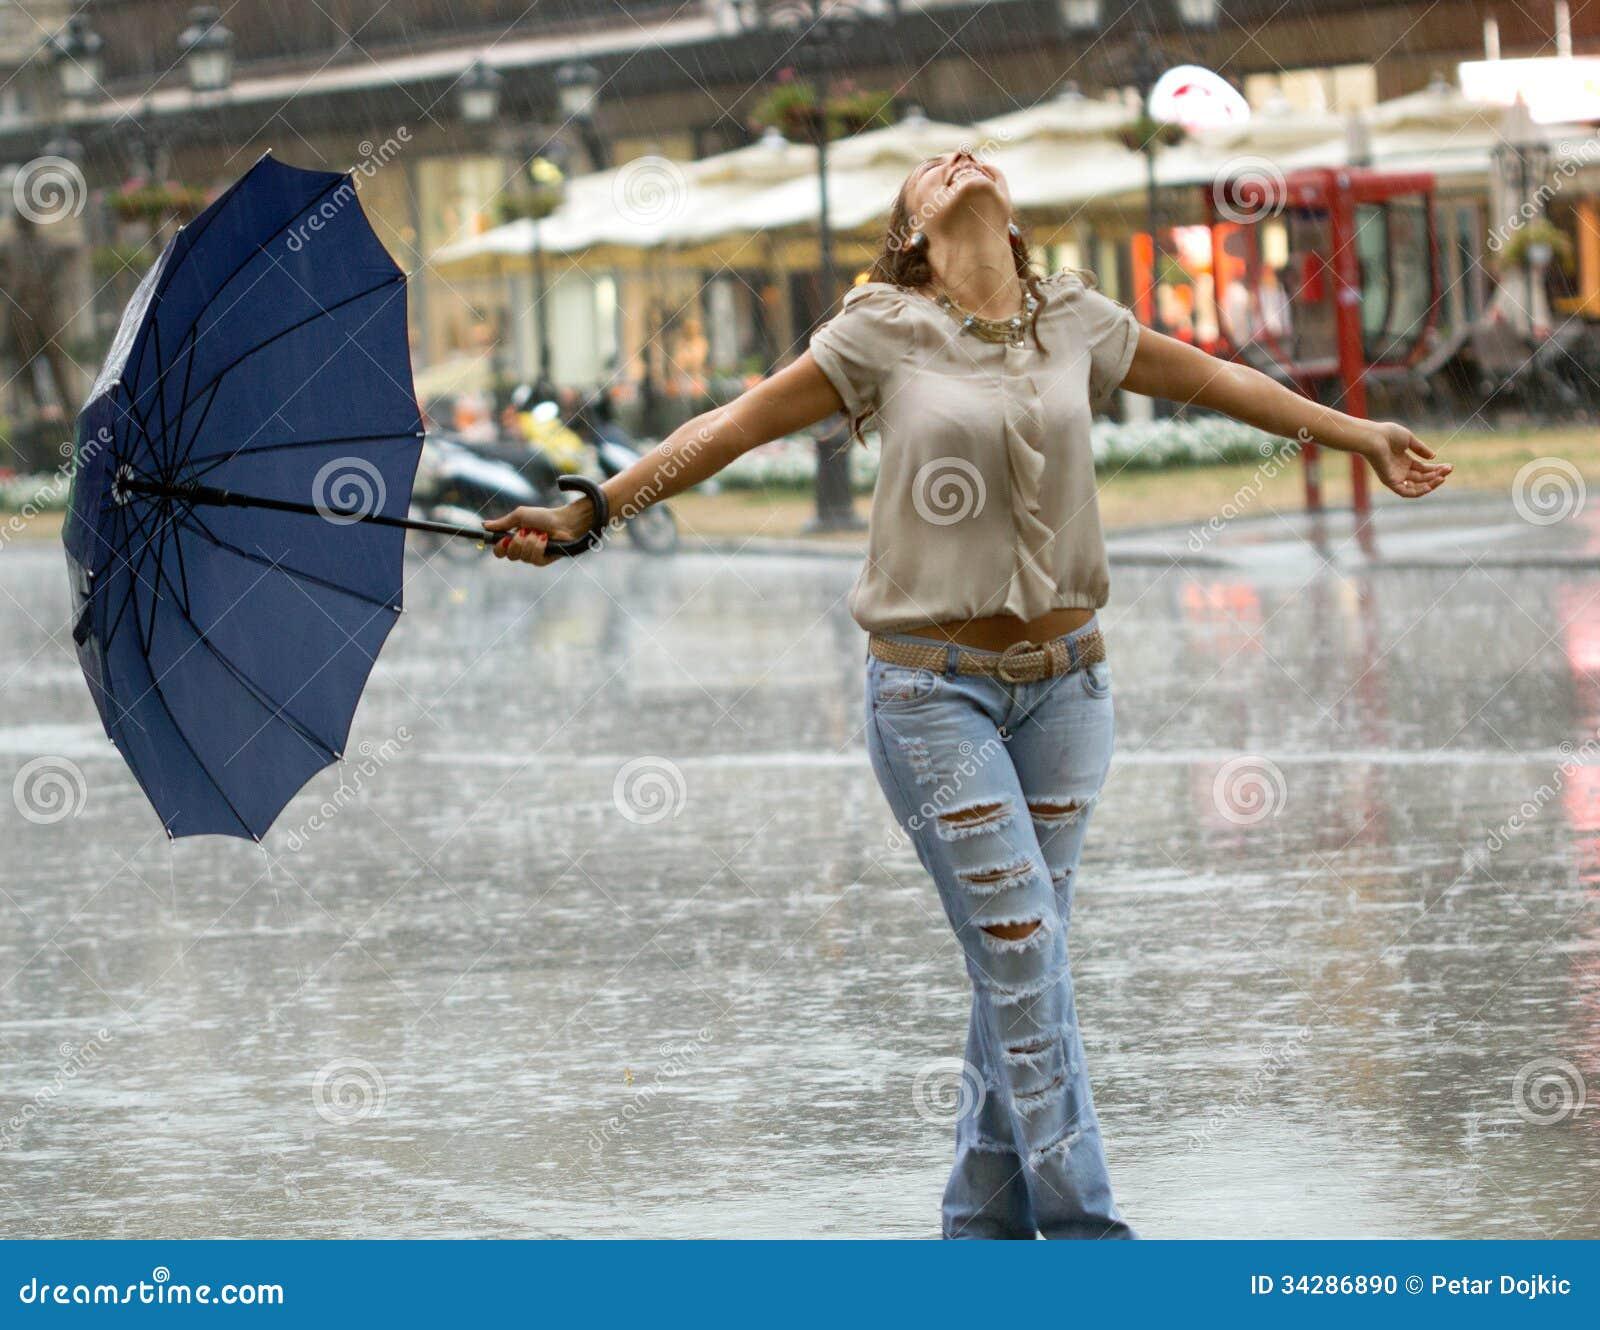 Happy Beautiful Woman Enjoying At Beach Stock Photo: Woman With Umbrella Enjoying In The Rain Stock Photo